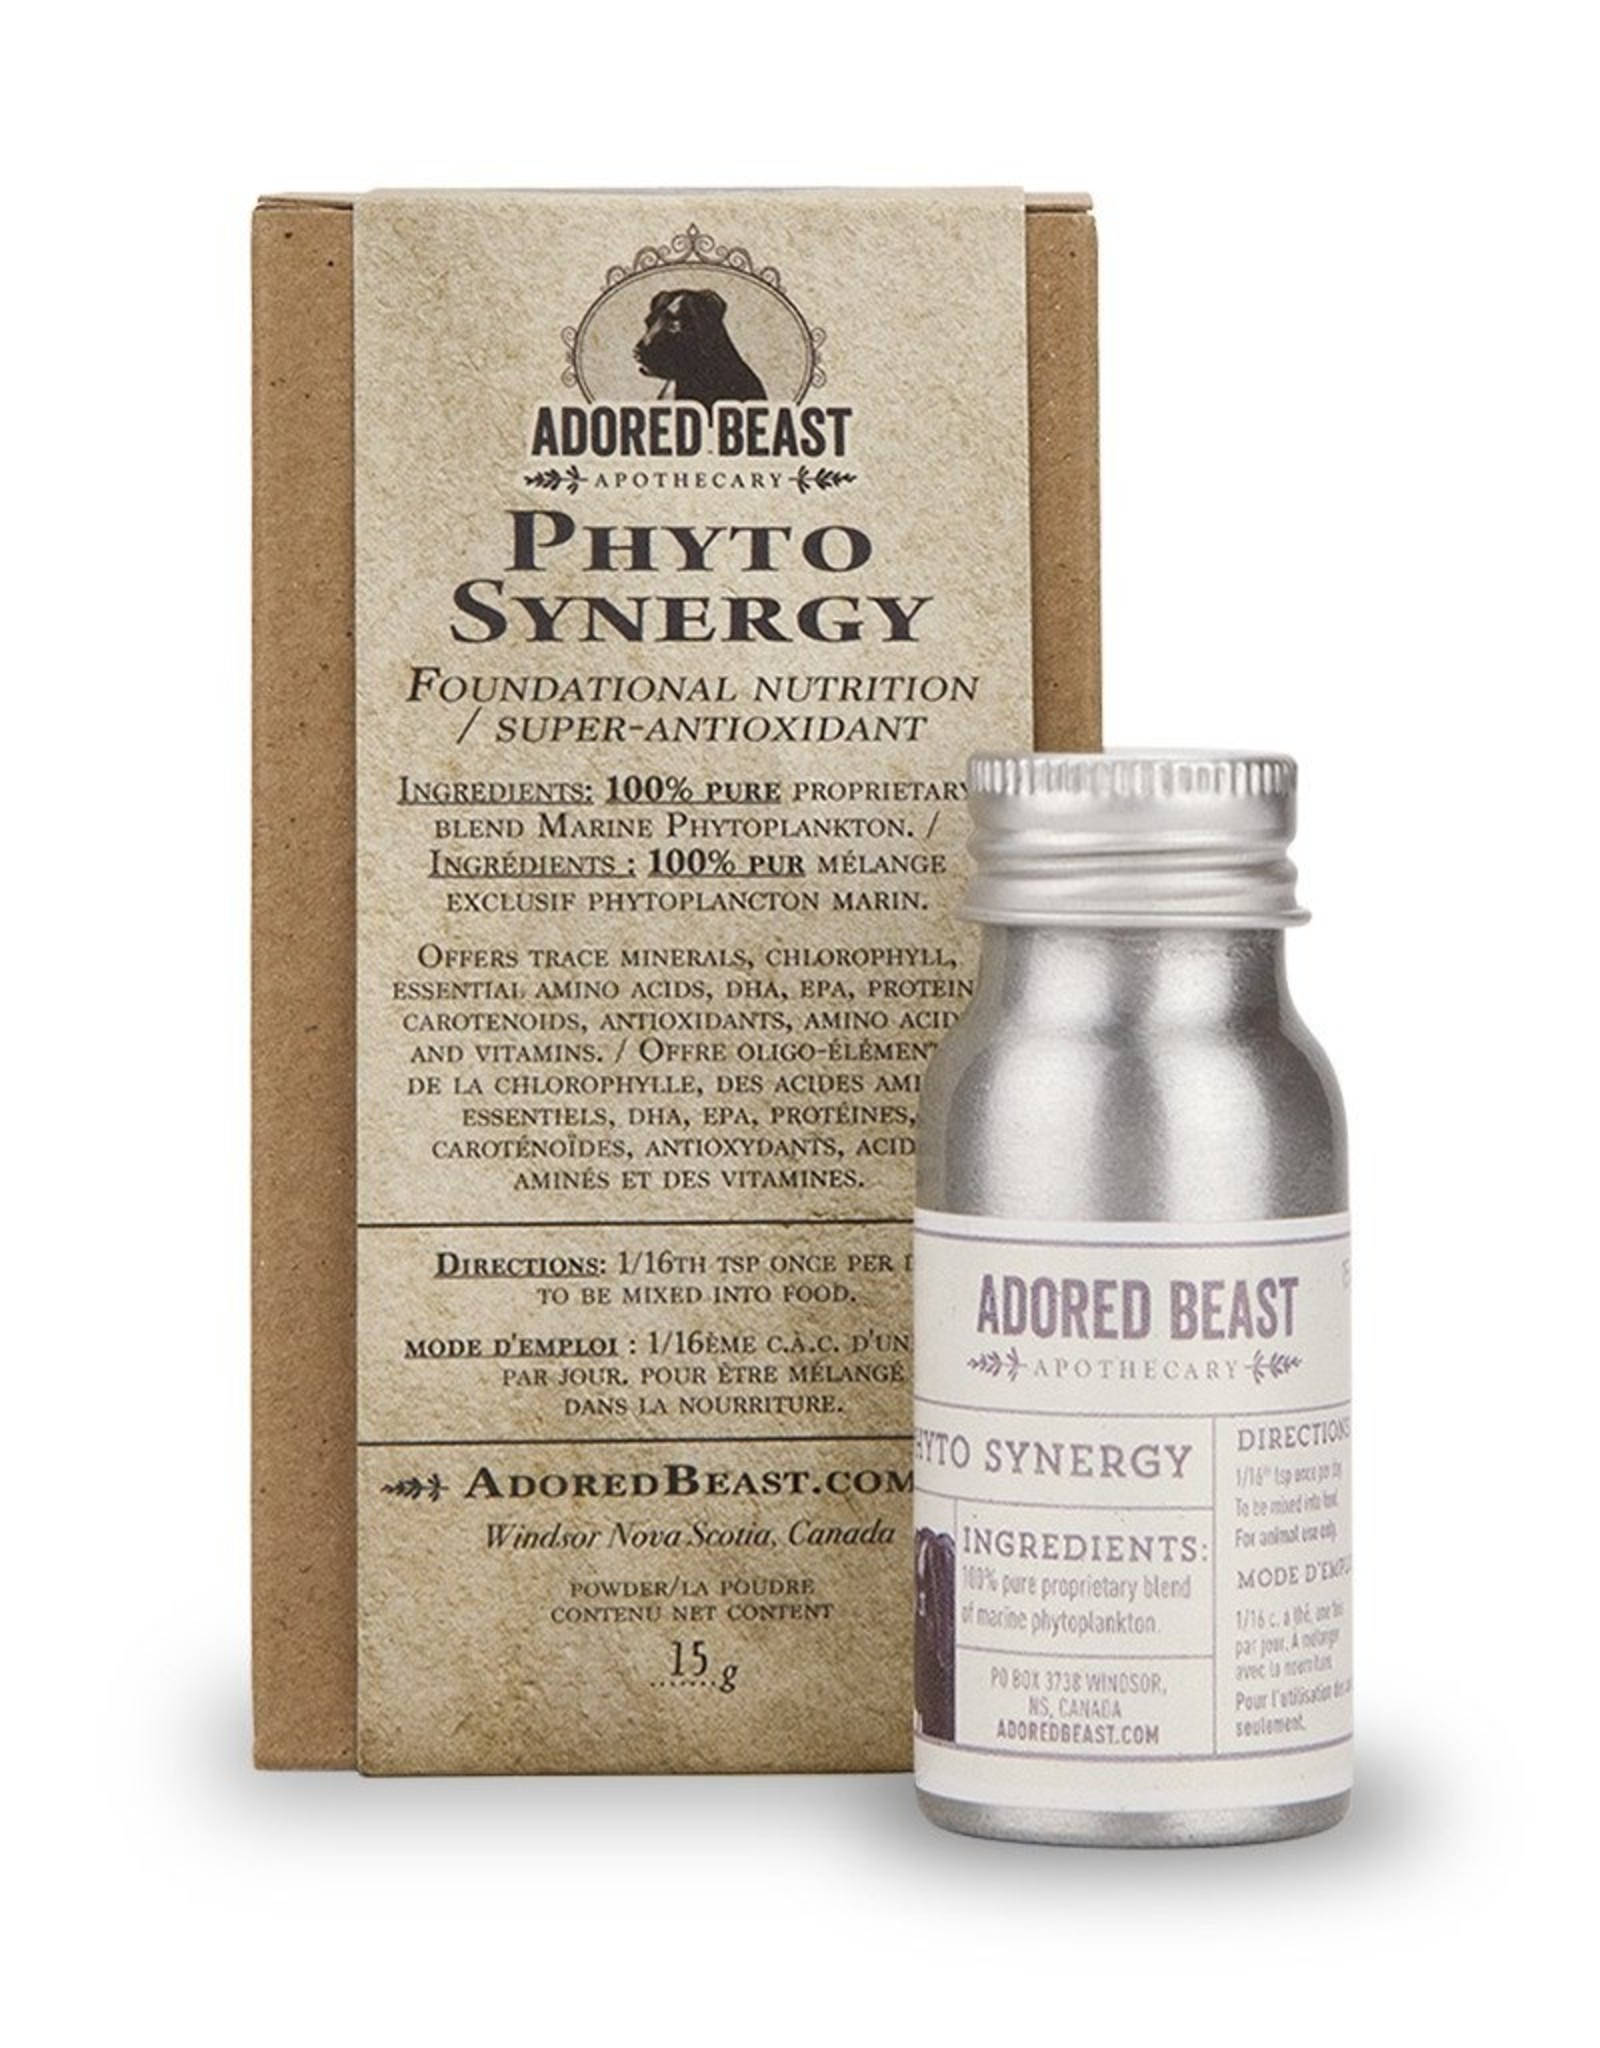 Adored Beast Apothecary Adored Beast Apothecary Phyto Synergy 15g